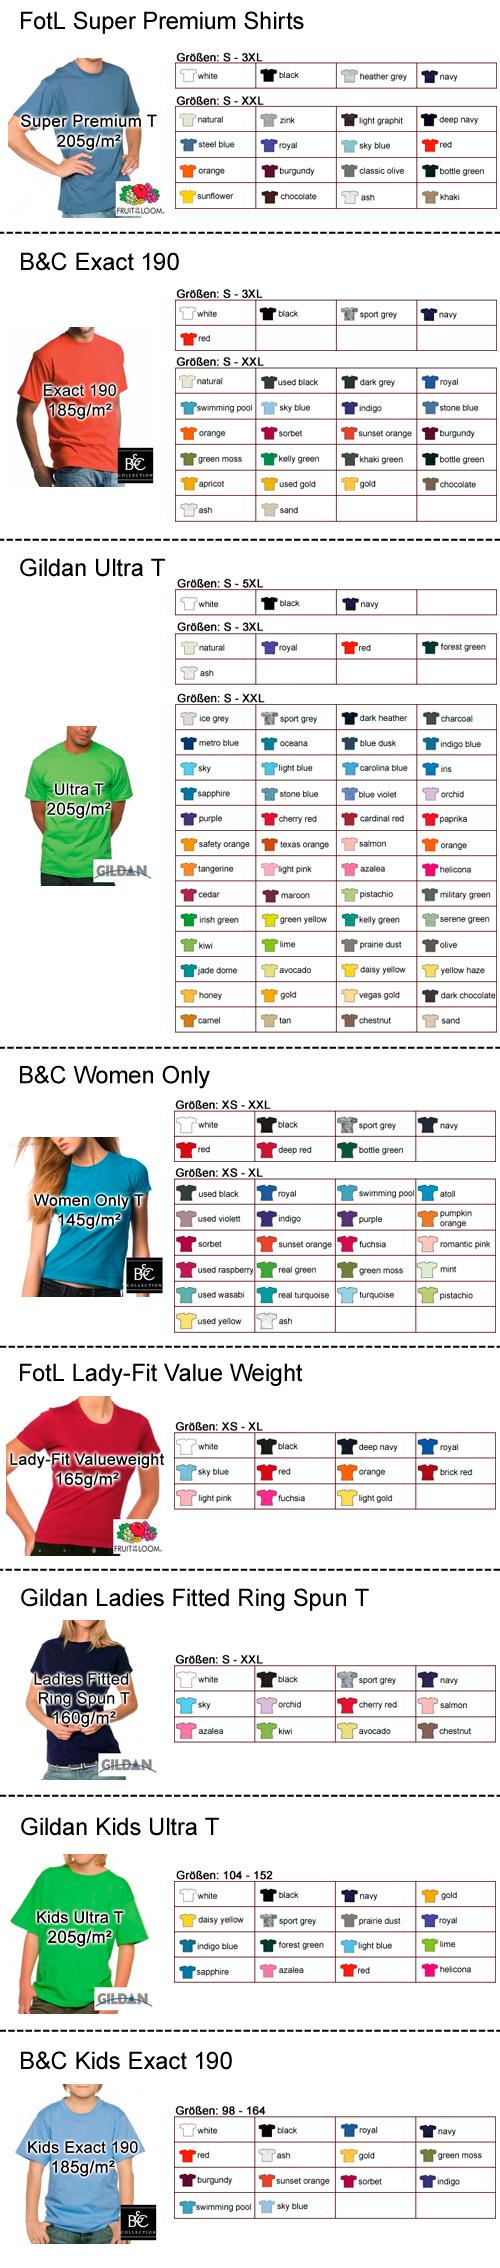 Shirtauswahl Premium Shirts